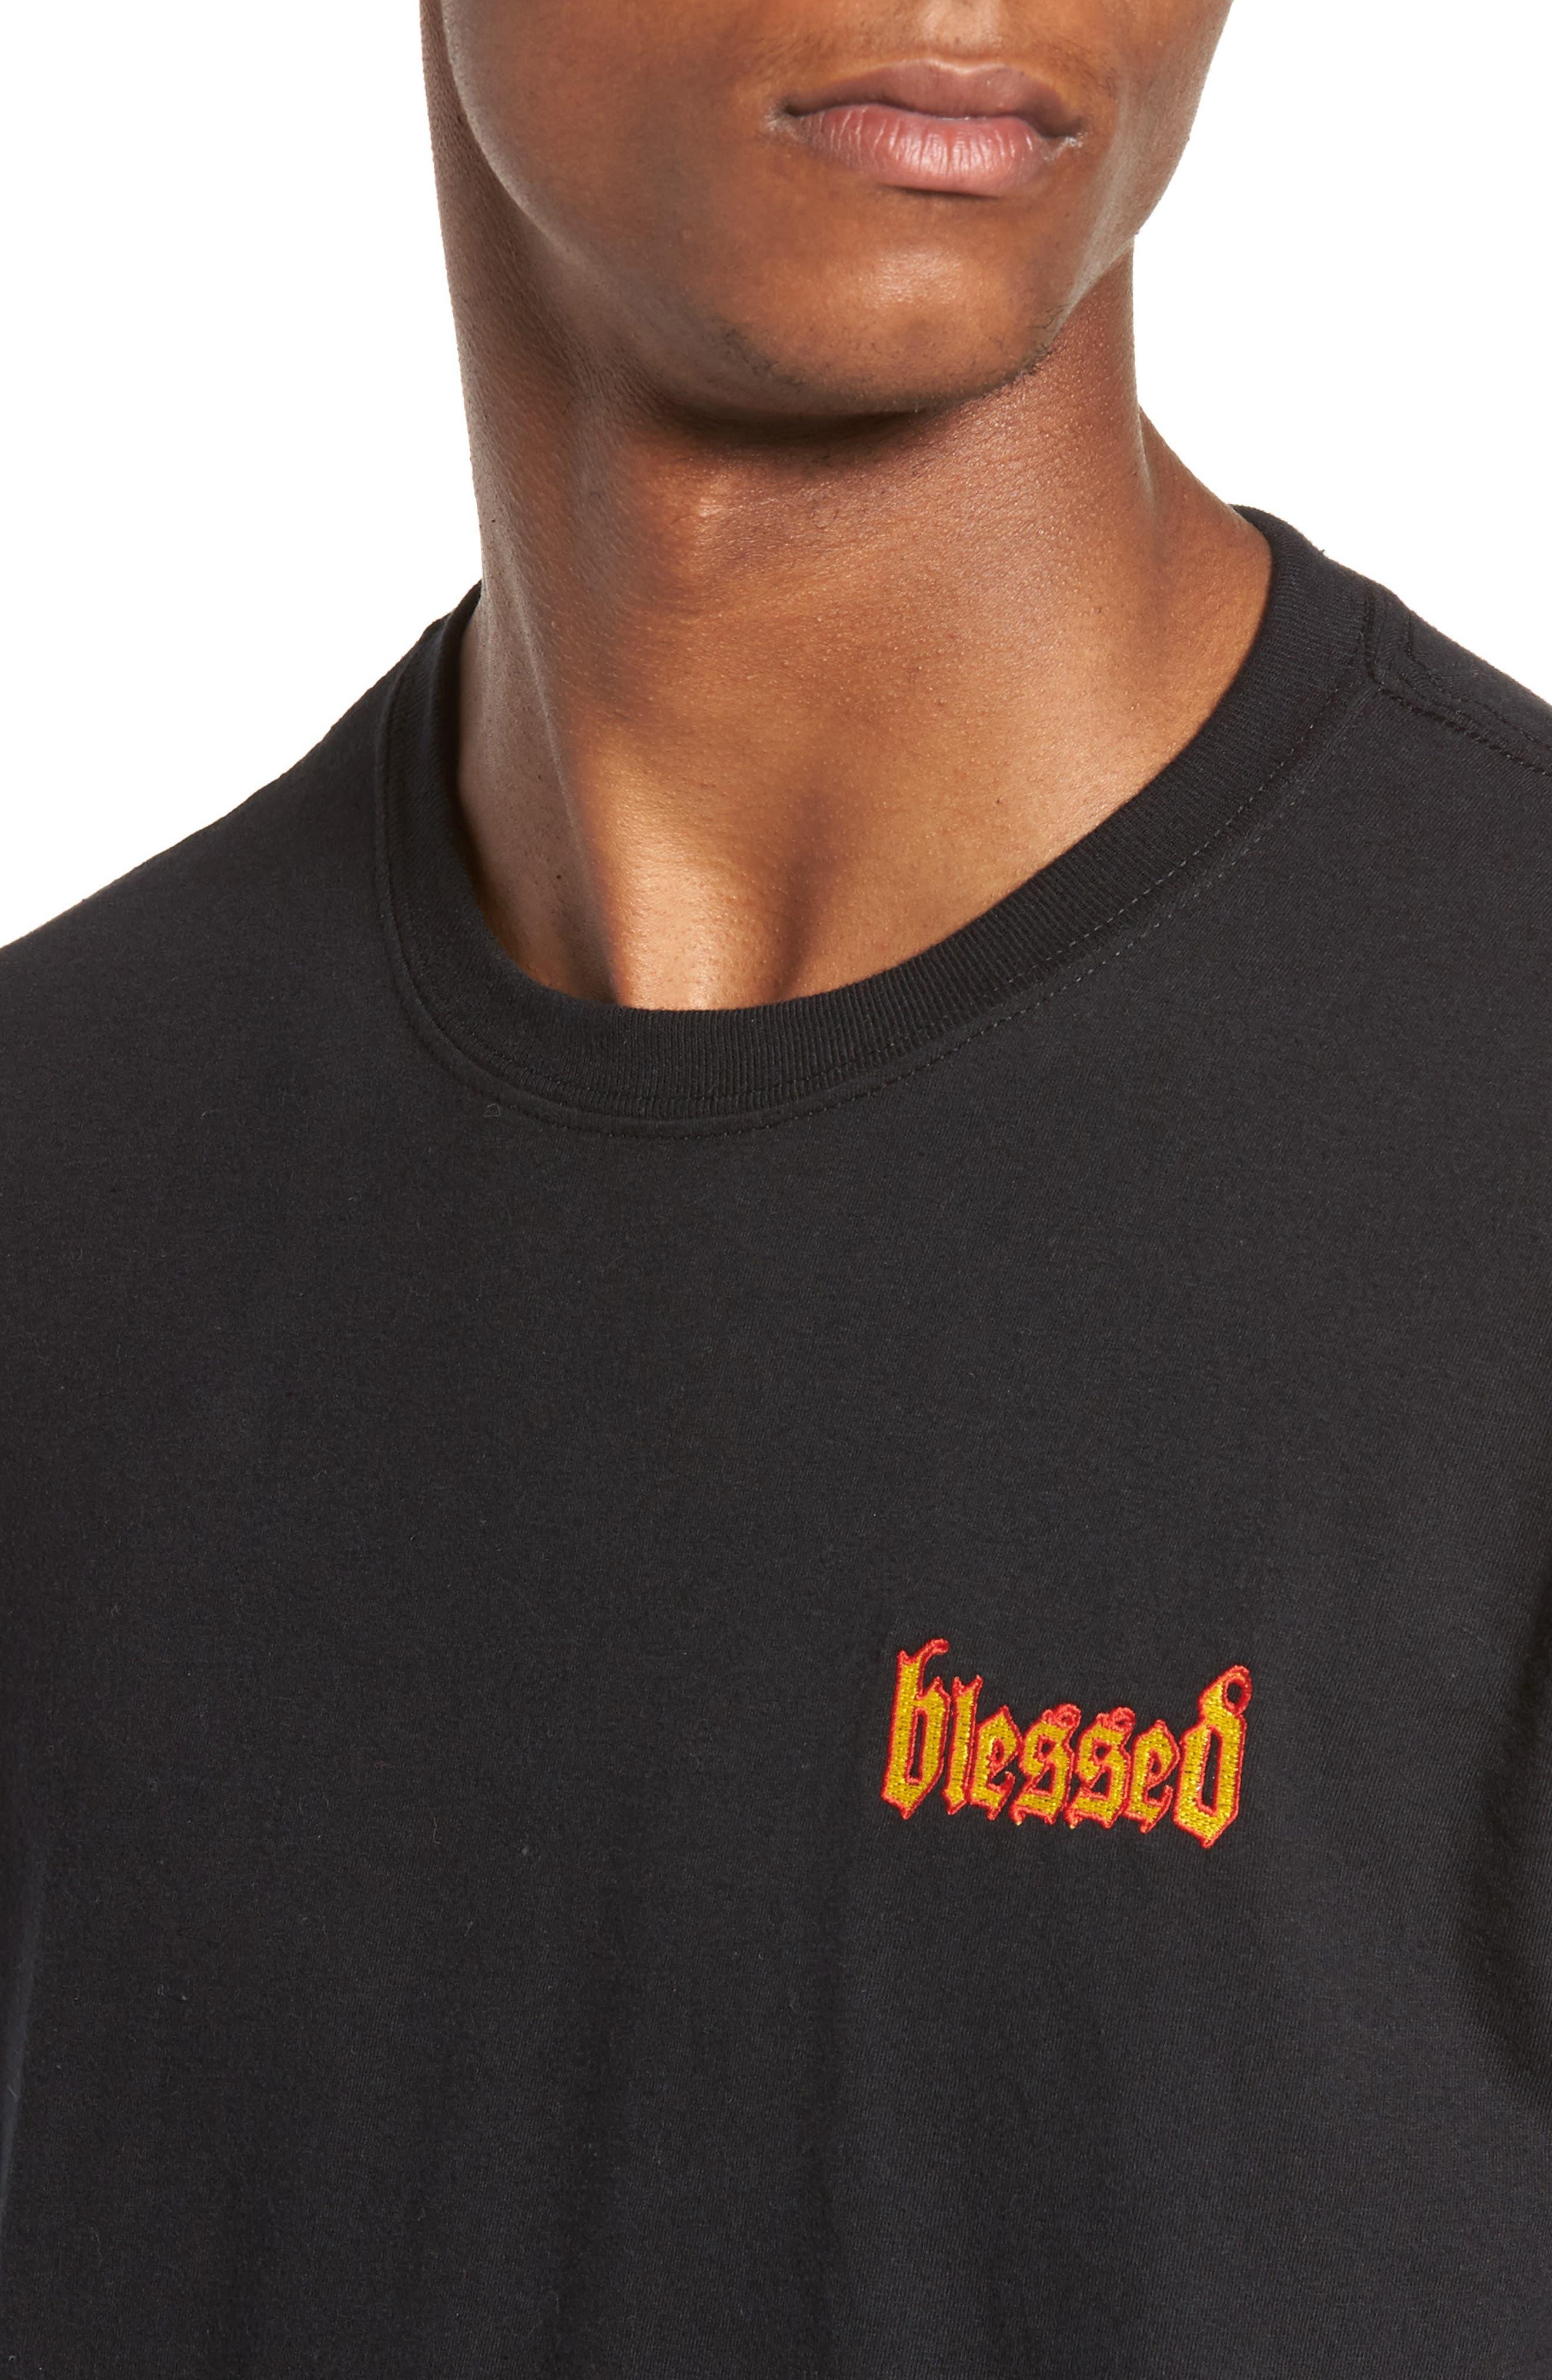 Blessed T-Shirt,                             Alternate thumbnail 4, color,